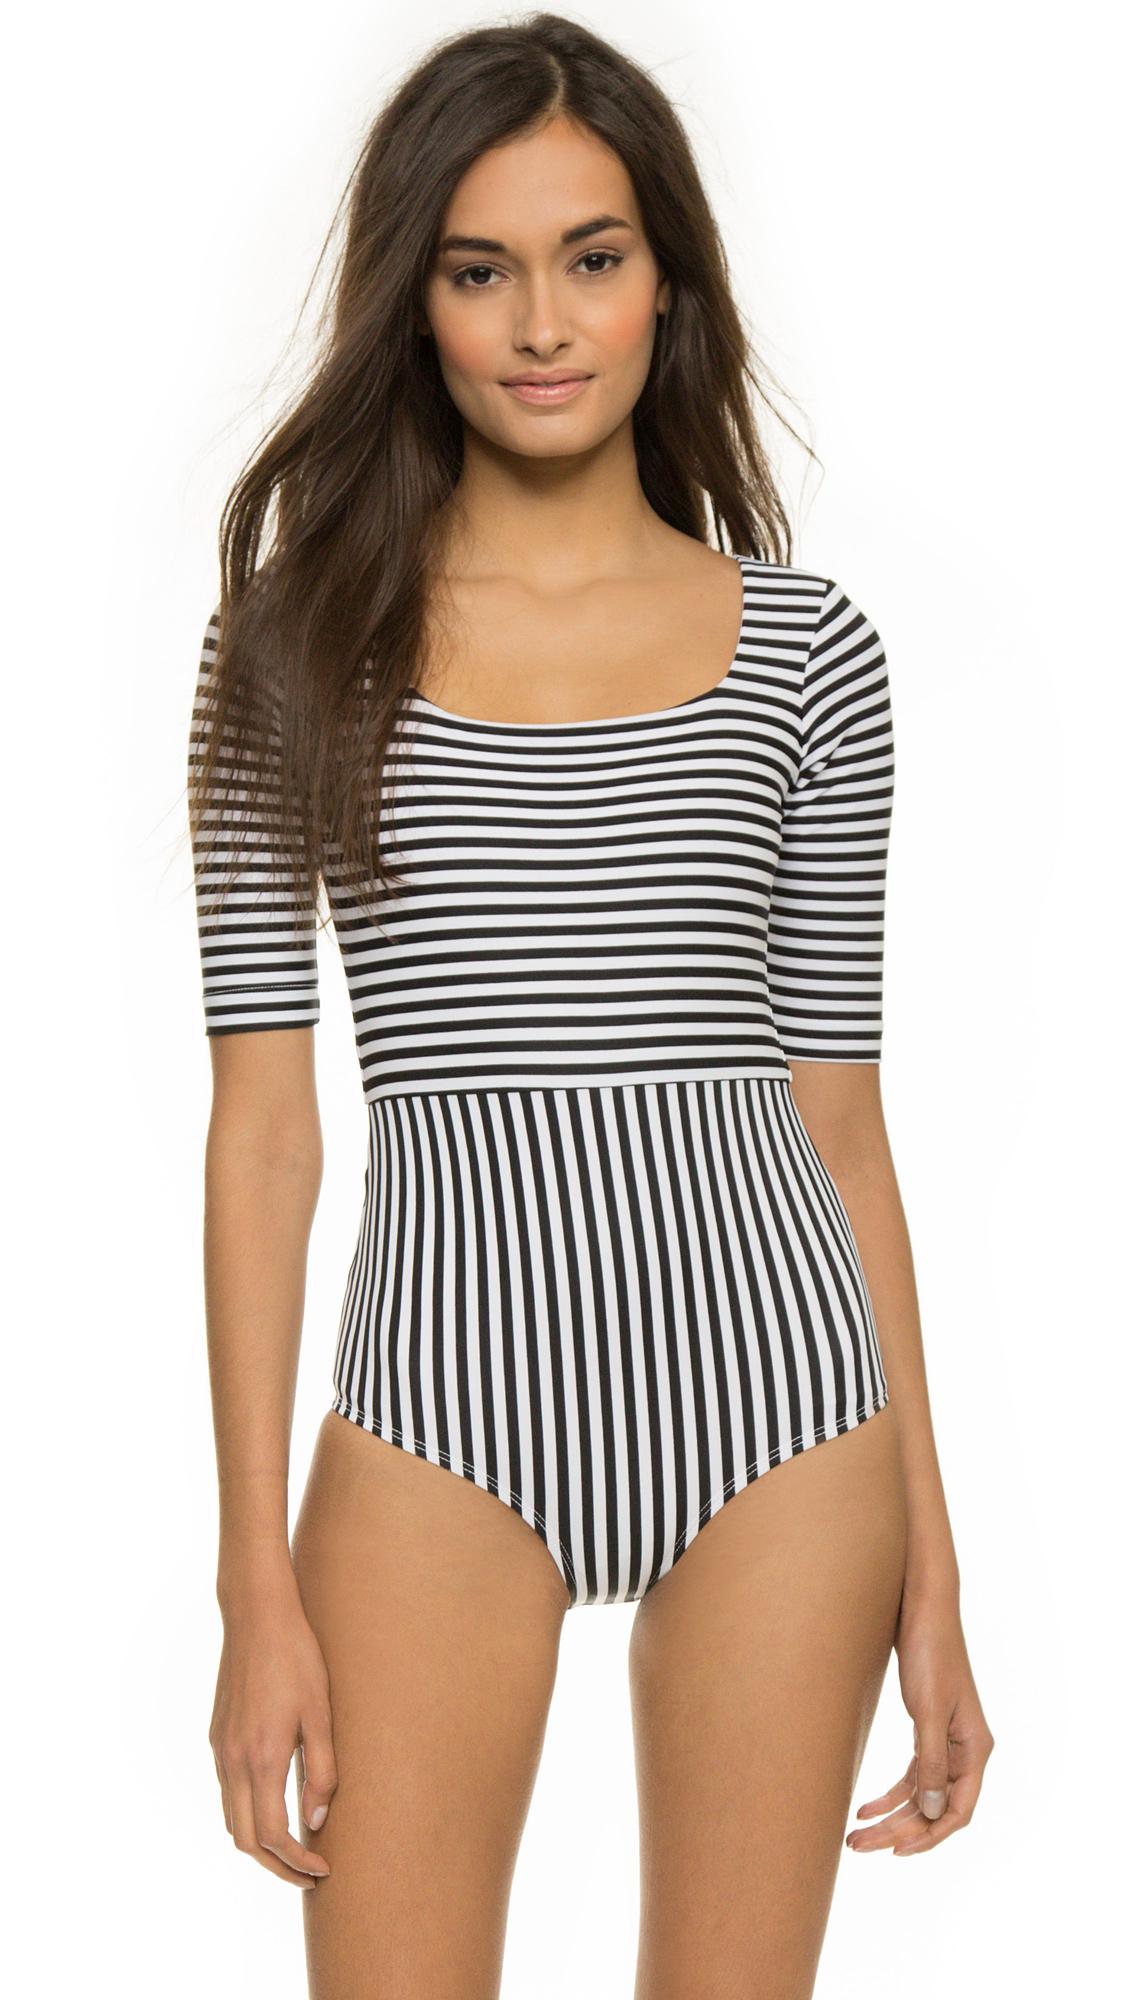 f63fd2ae341 Seea Zuma Swimsuit - Black Stripe in Black - Lyst